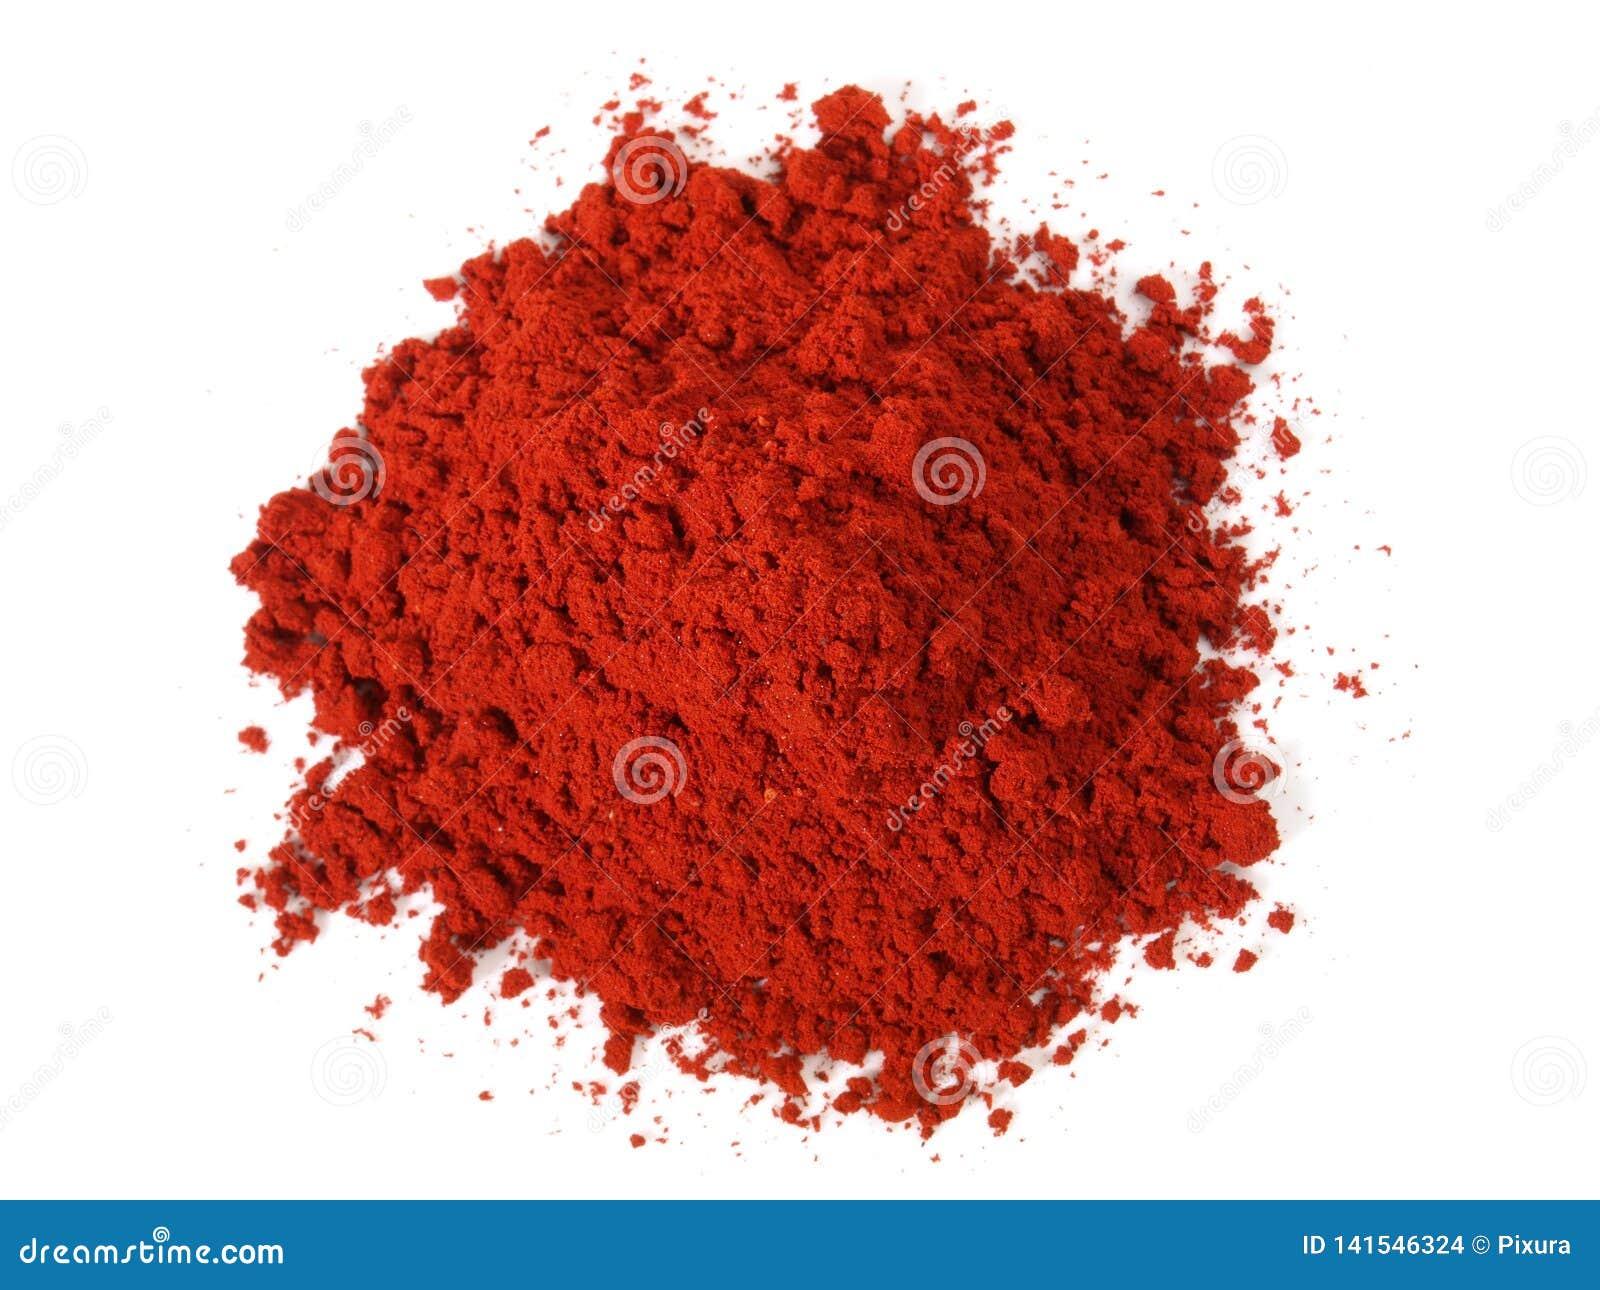 Dragon Resin Powder rosso